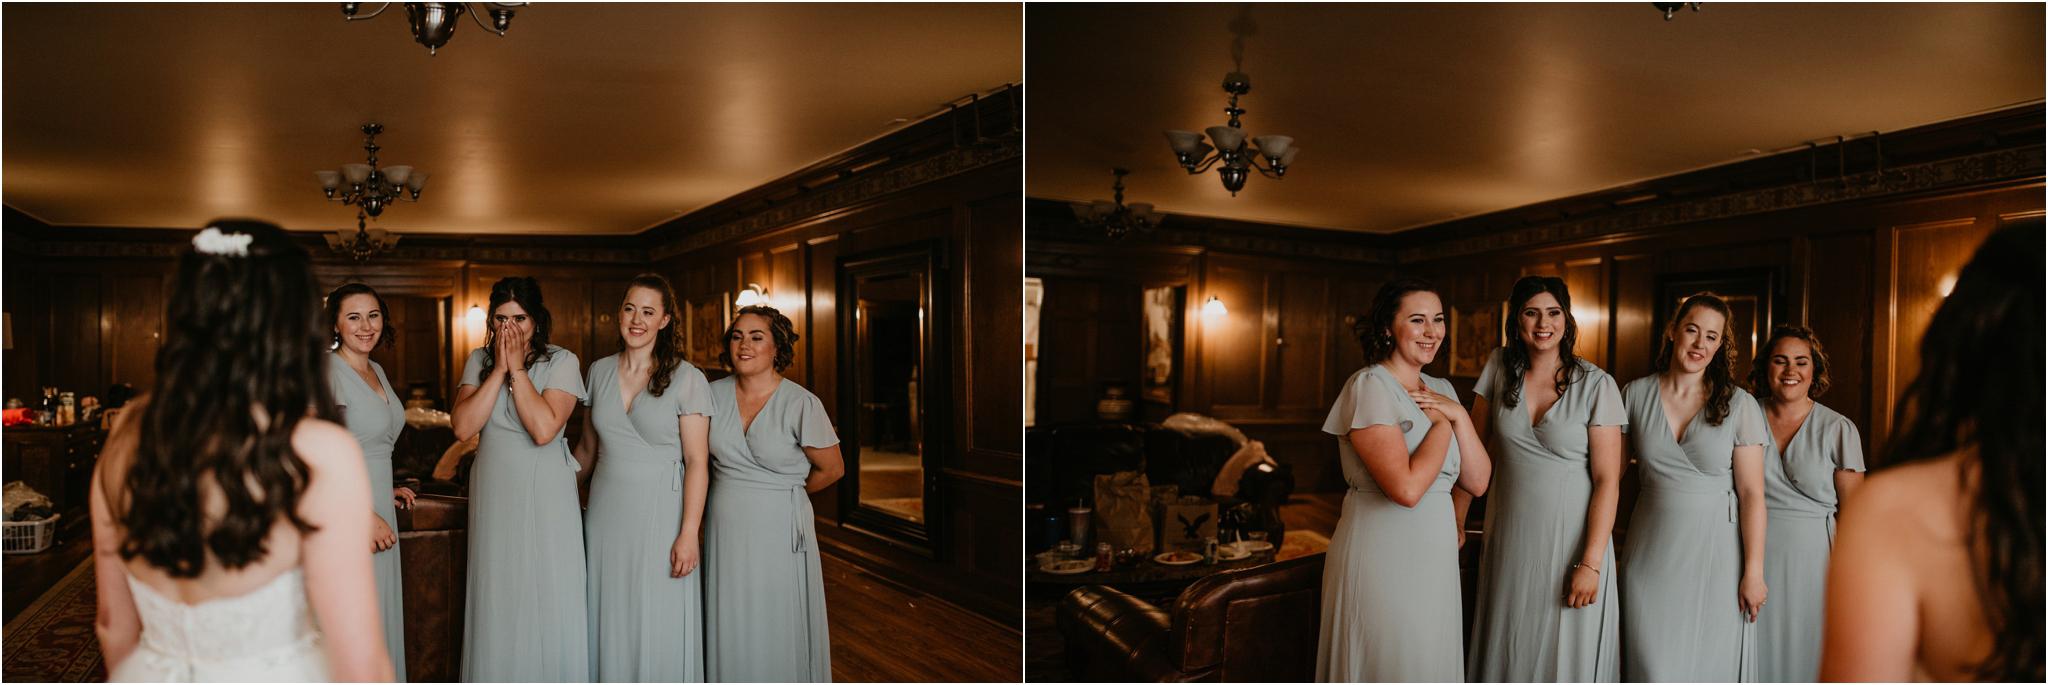 chance-and-ondrea-lairmont-manor-wedding-seattle-photographer-020.jpg